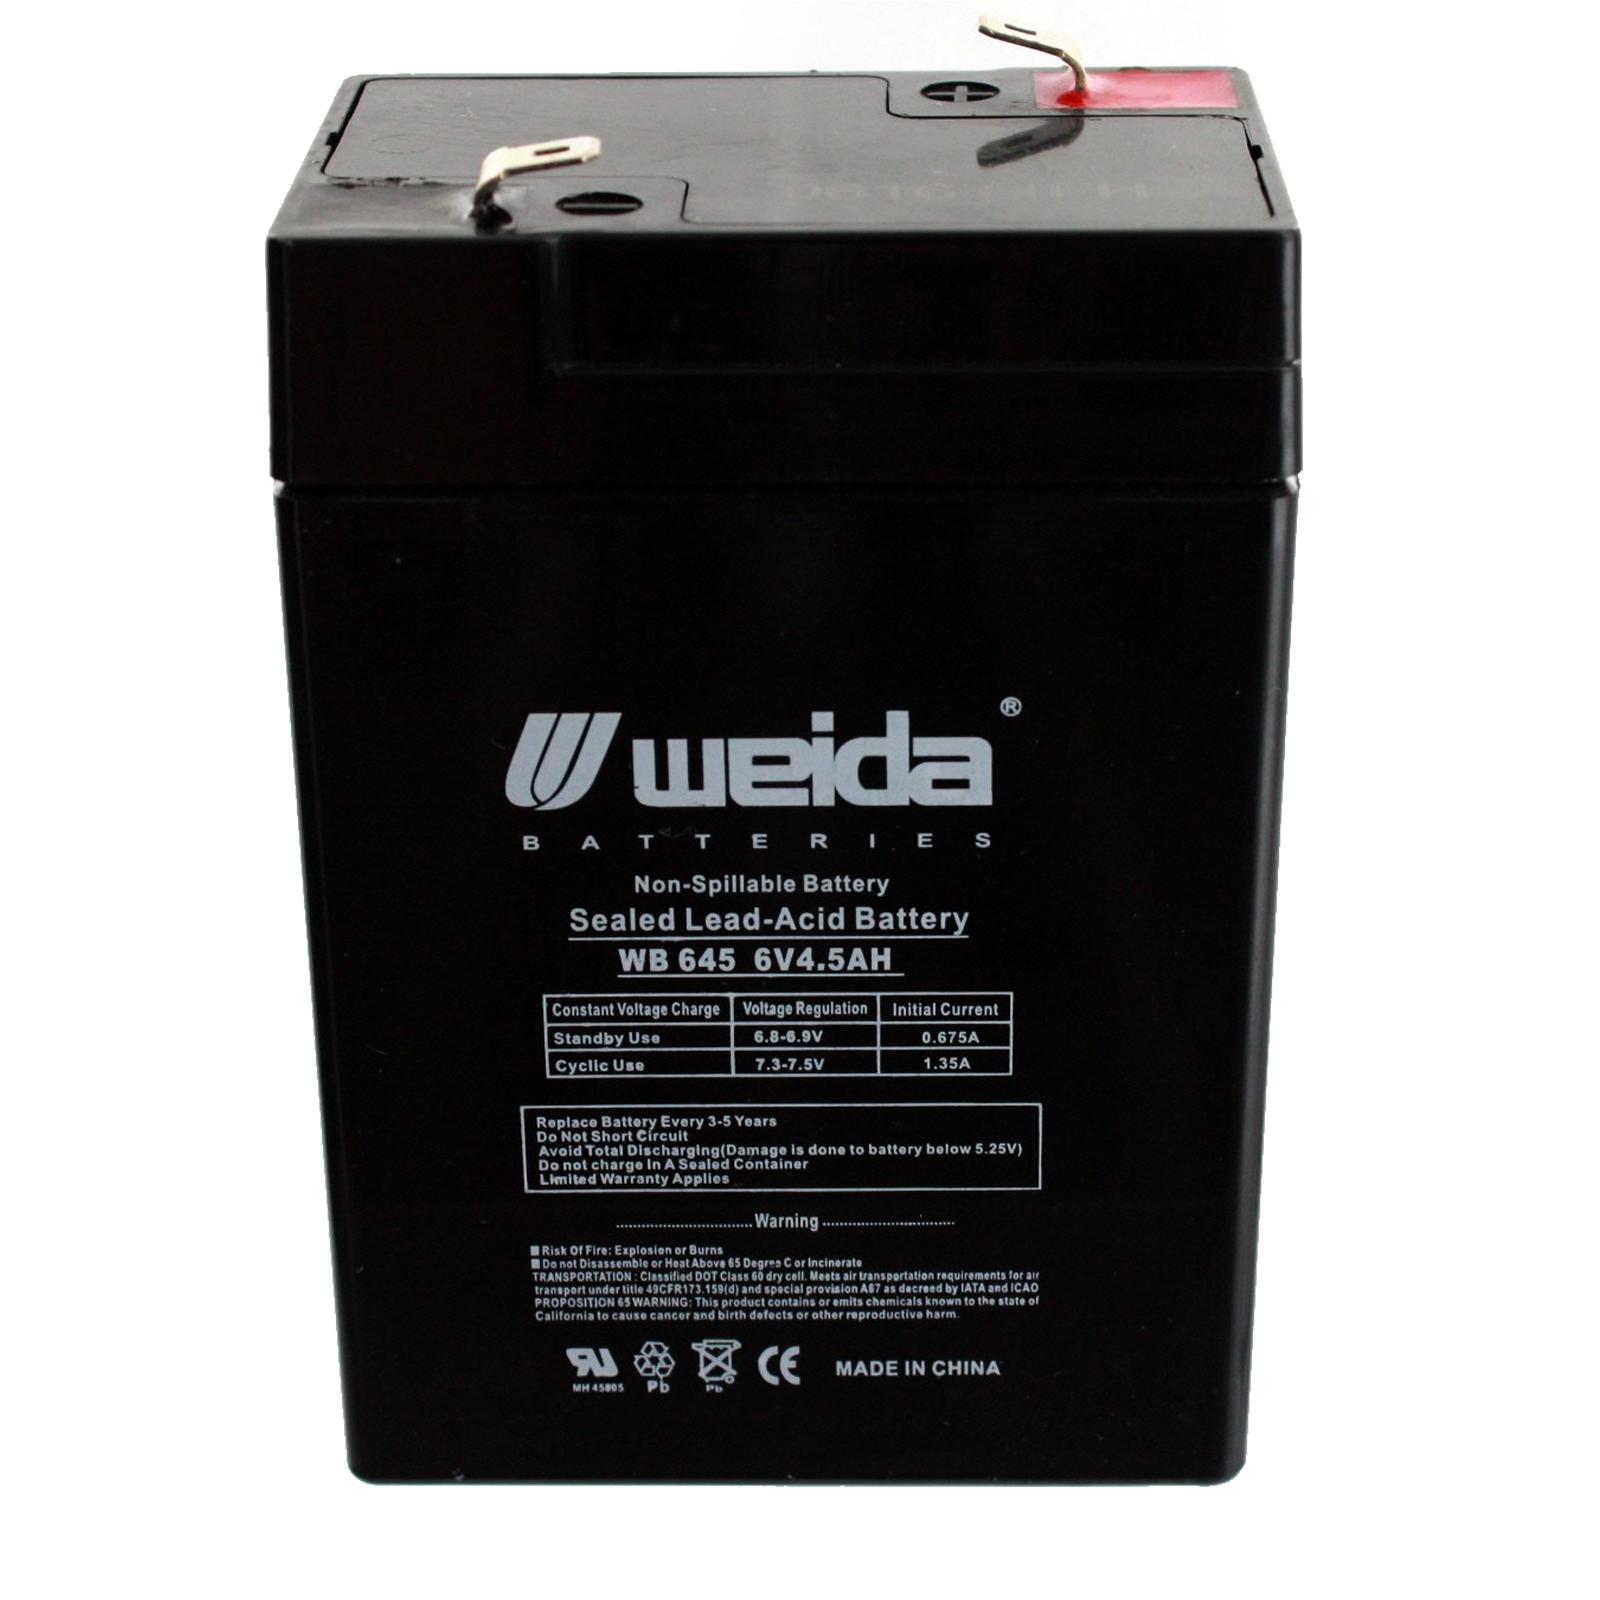 New 6v 4 5ah Sla Battery Wb645 For Ub645 Ps640f Np4 5 6